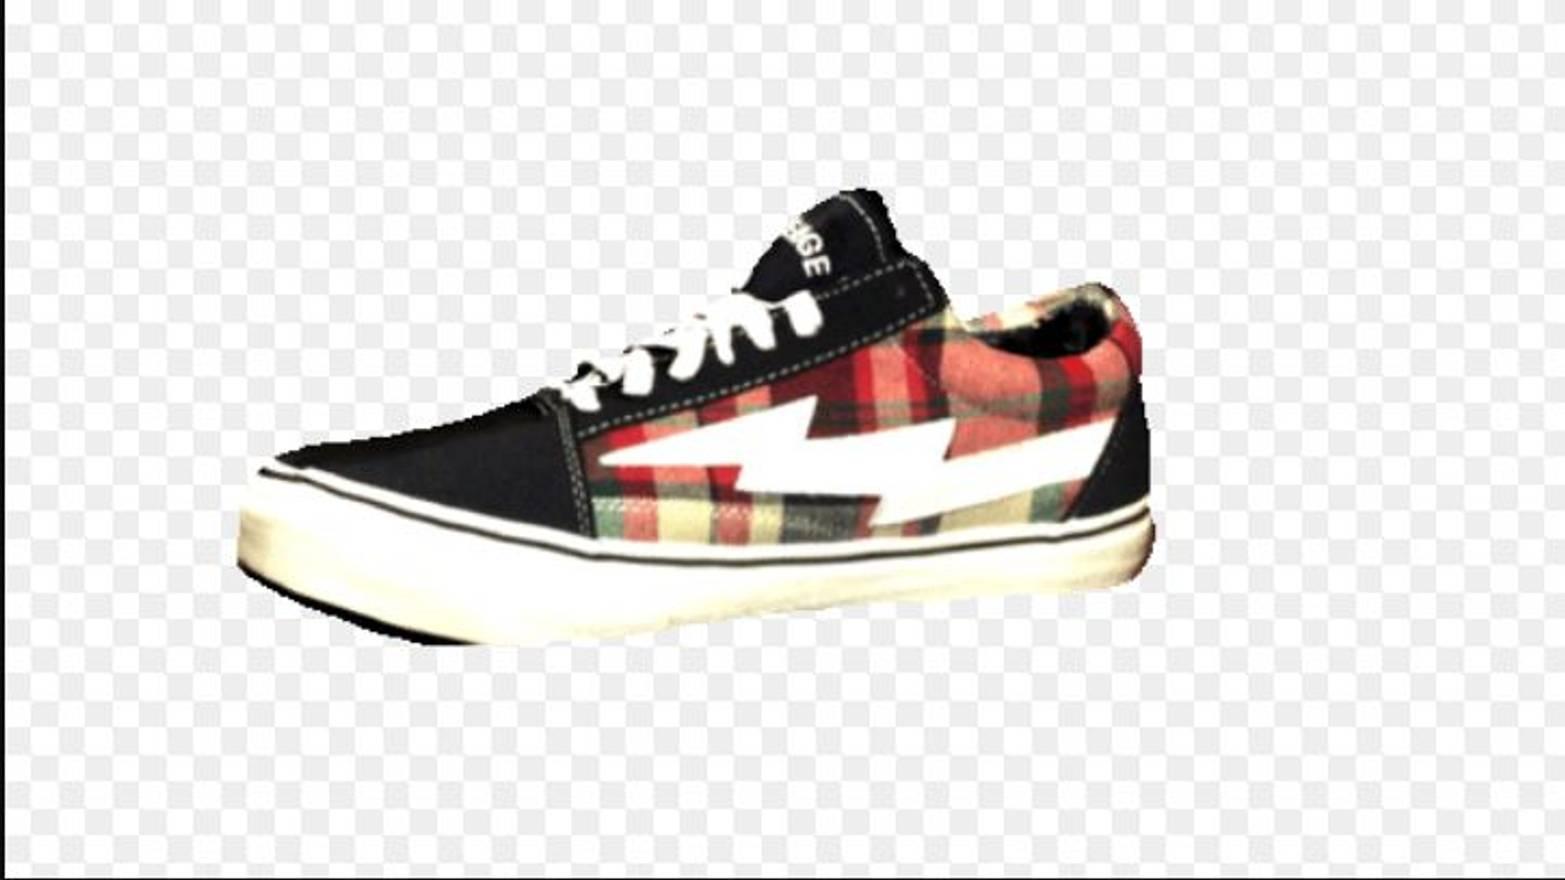 40175522ad6 ... Ian Connor Revenge X Storm Shoe Black Plaid Size 9 Van Lightning Skate  Blood New Ian ...